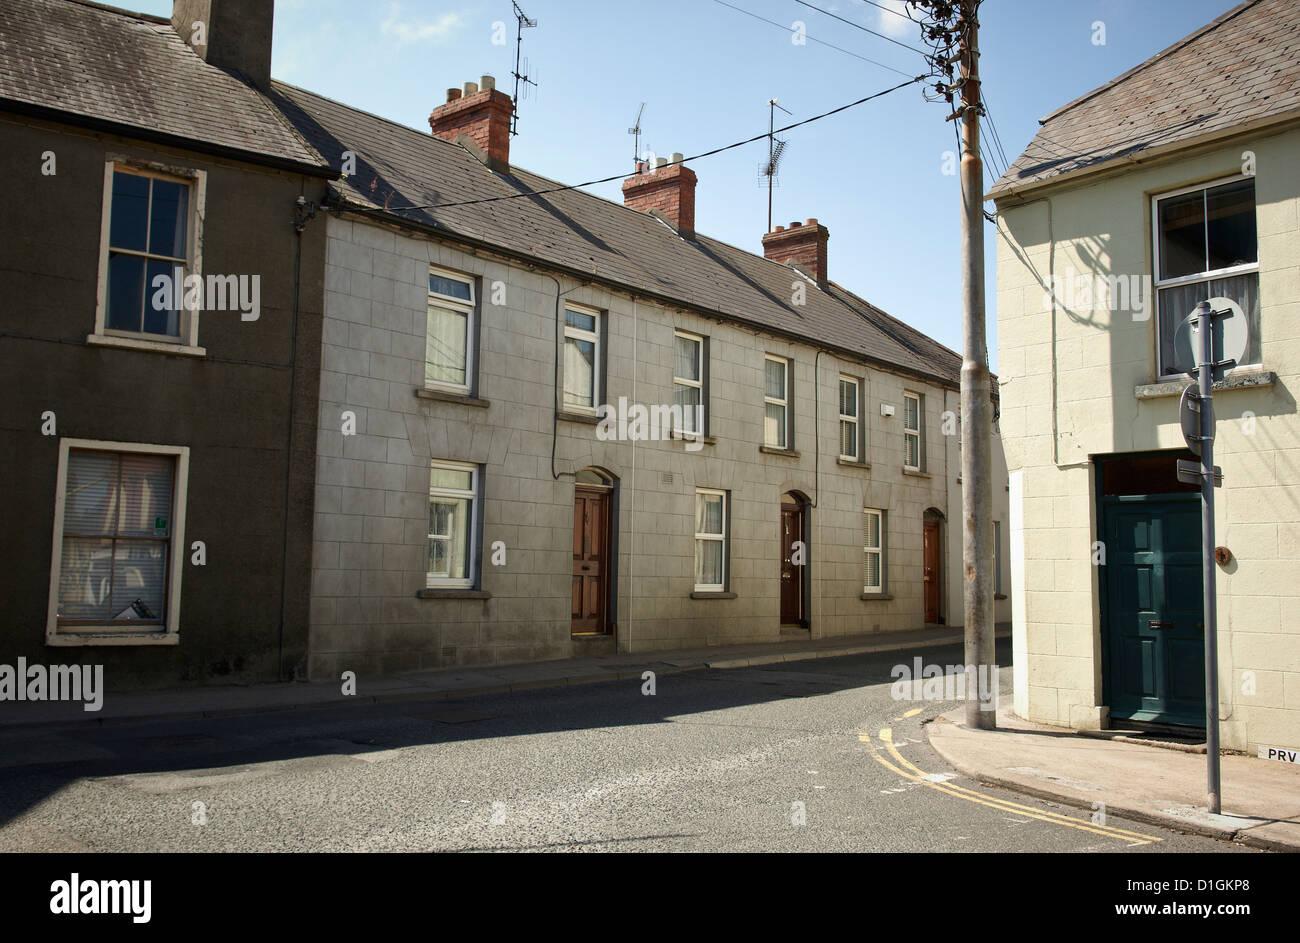 Street scene, Wexford, Leinster, Republic of Ireland, Europe - Stock Image